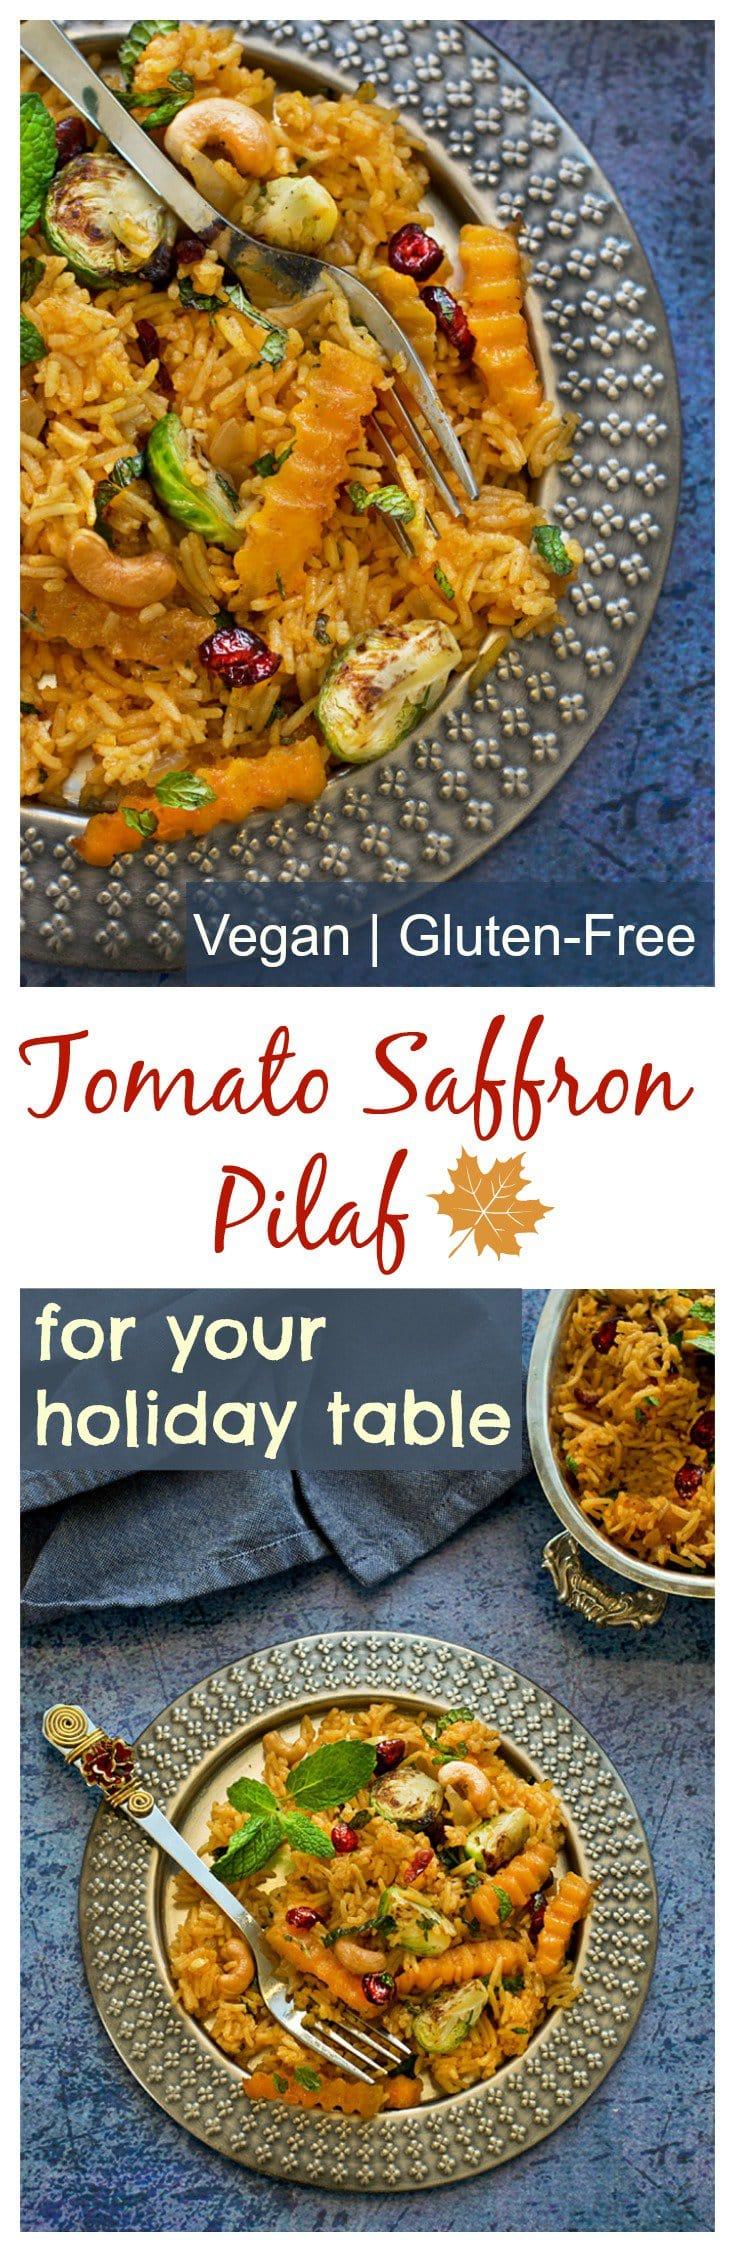 fall-harvest-tomato-saffron-pilaf-vegan-glutenfree